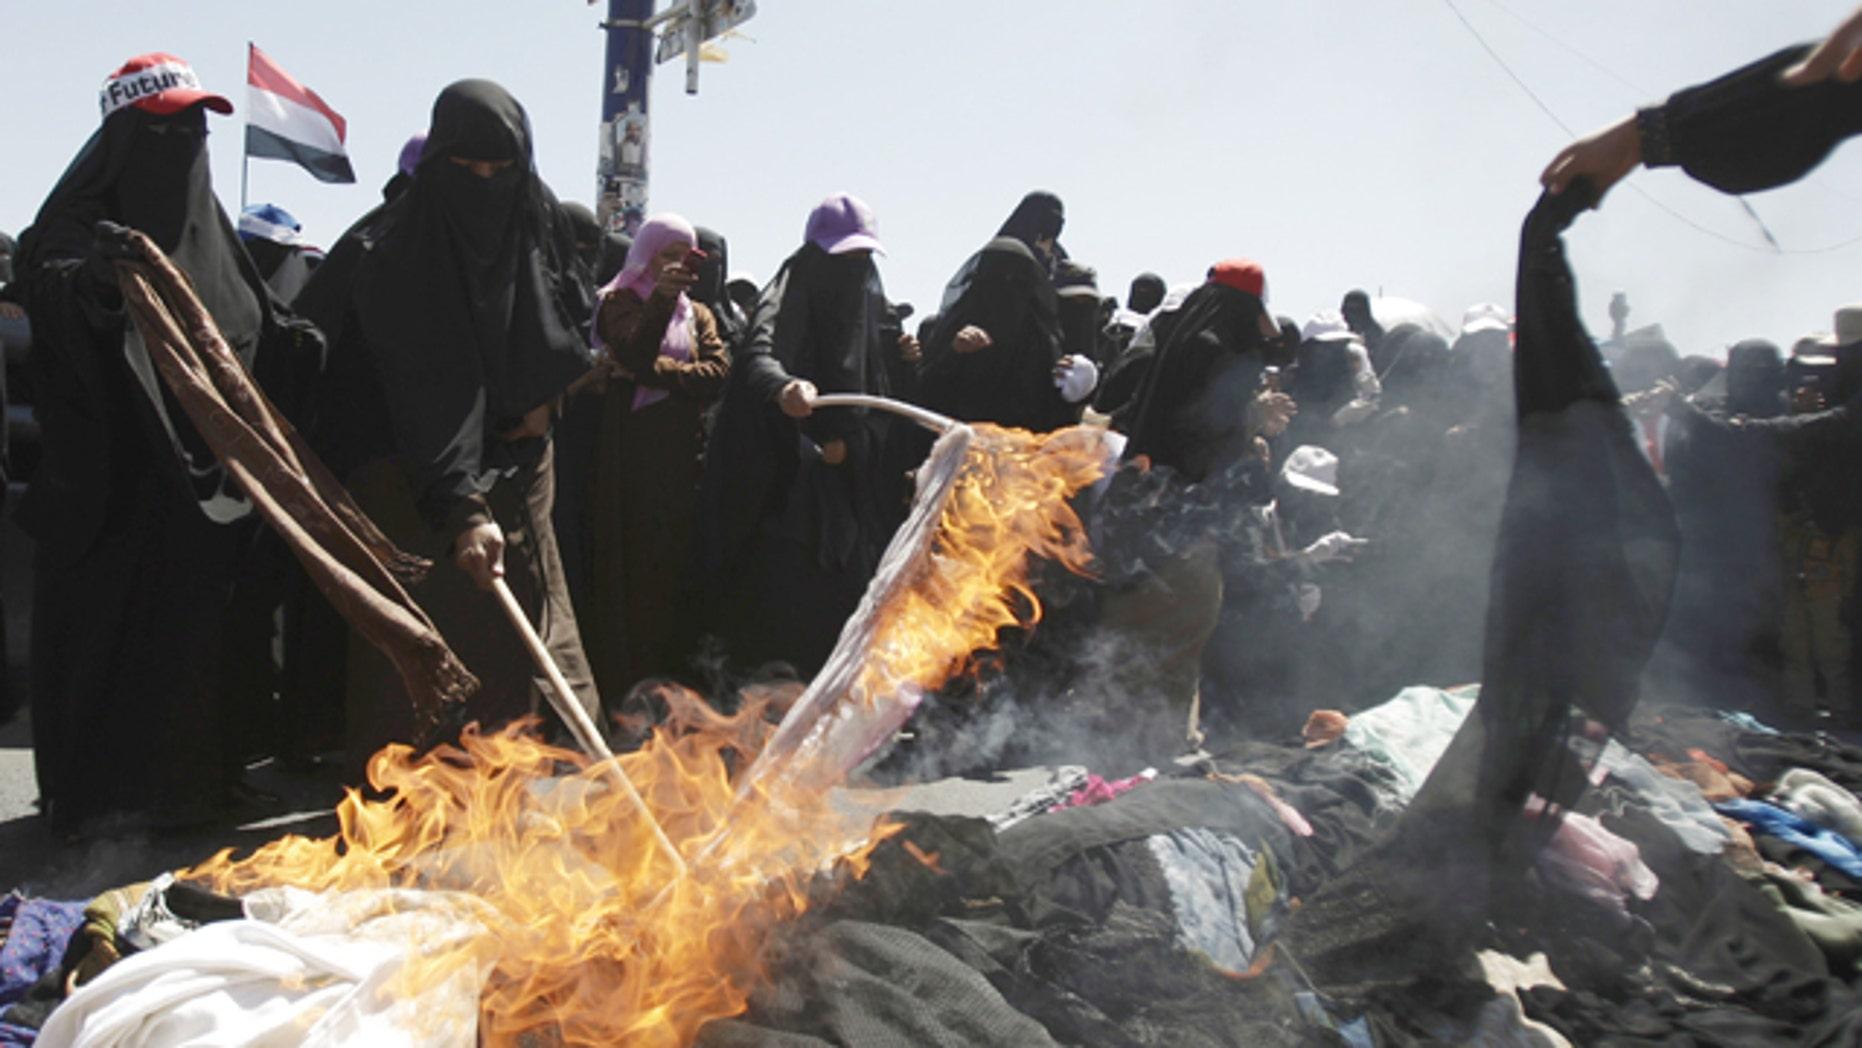 Oct. 26, 2011: Protesting Yemeni women burn their veils during a demonstration demanding the resignation of Yemeni President Ali Abdullah Saleh in Sanaa, Yemen.